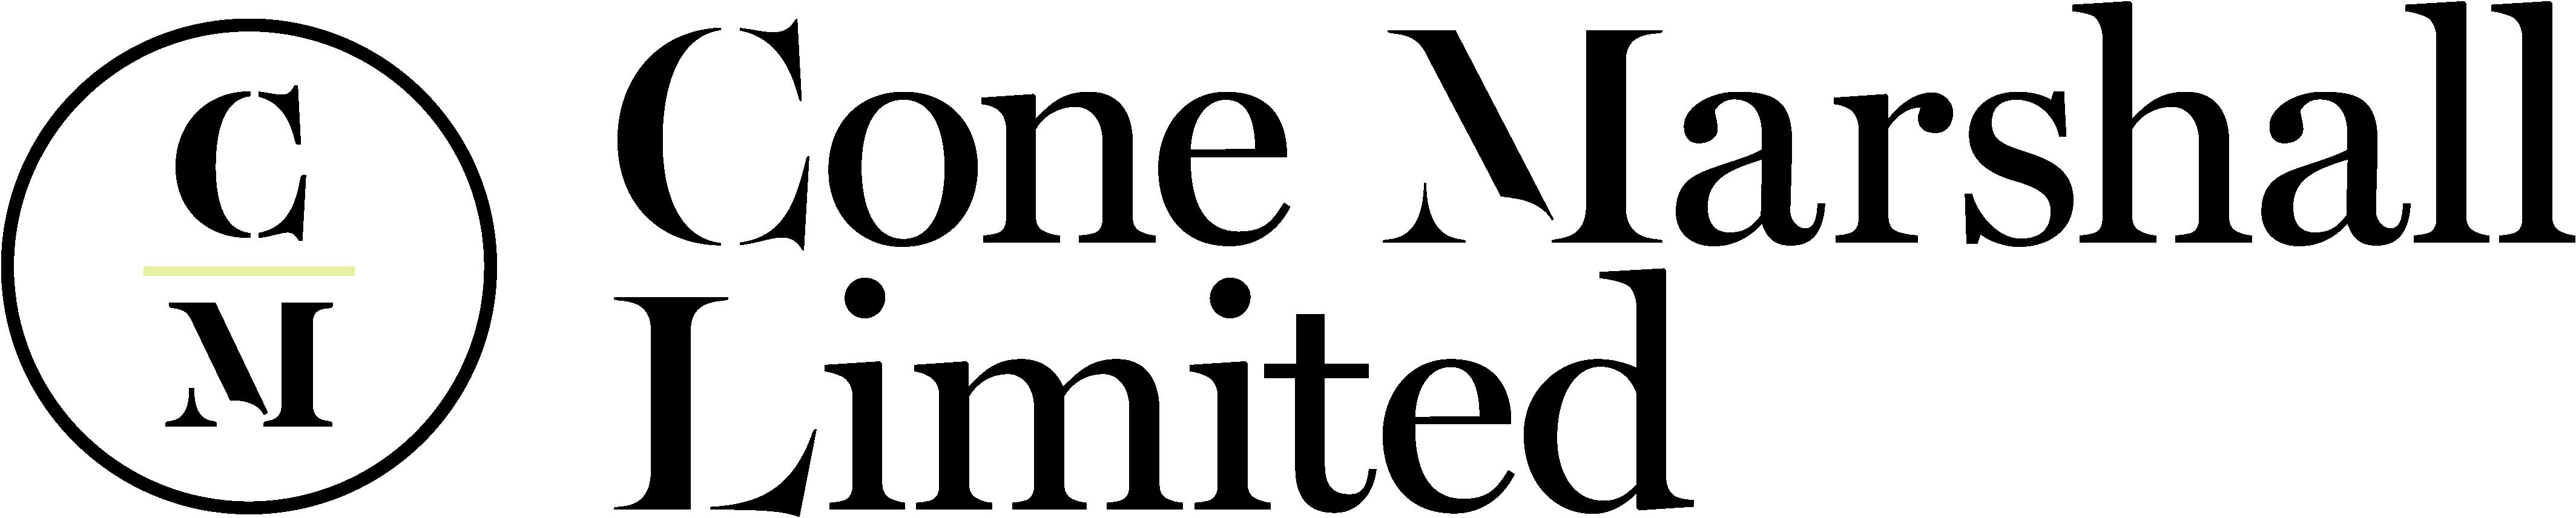 Cone Marshall NZ